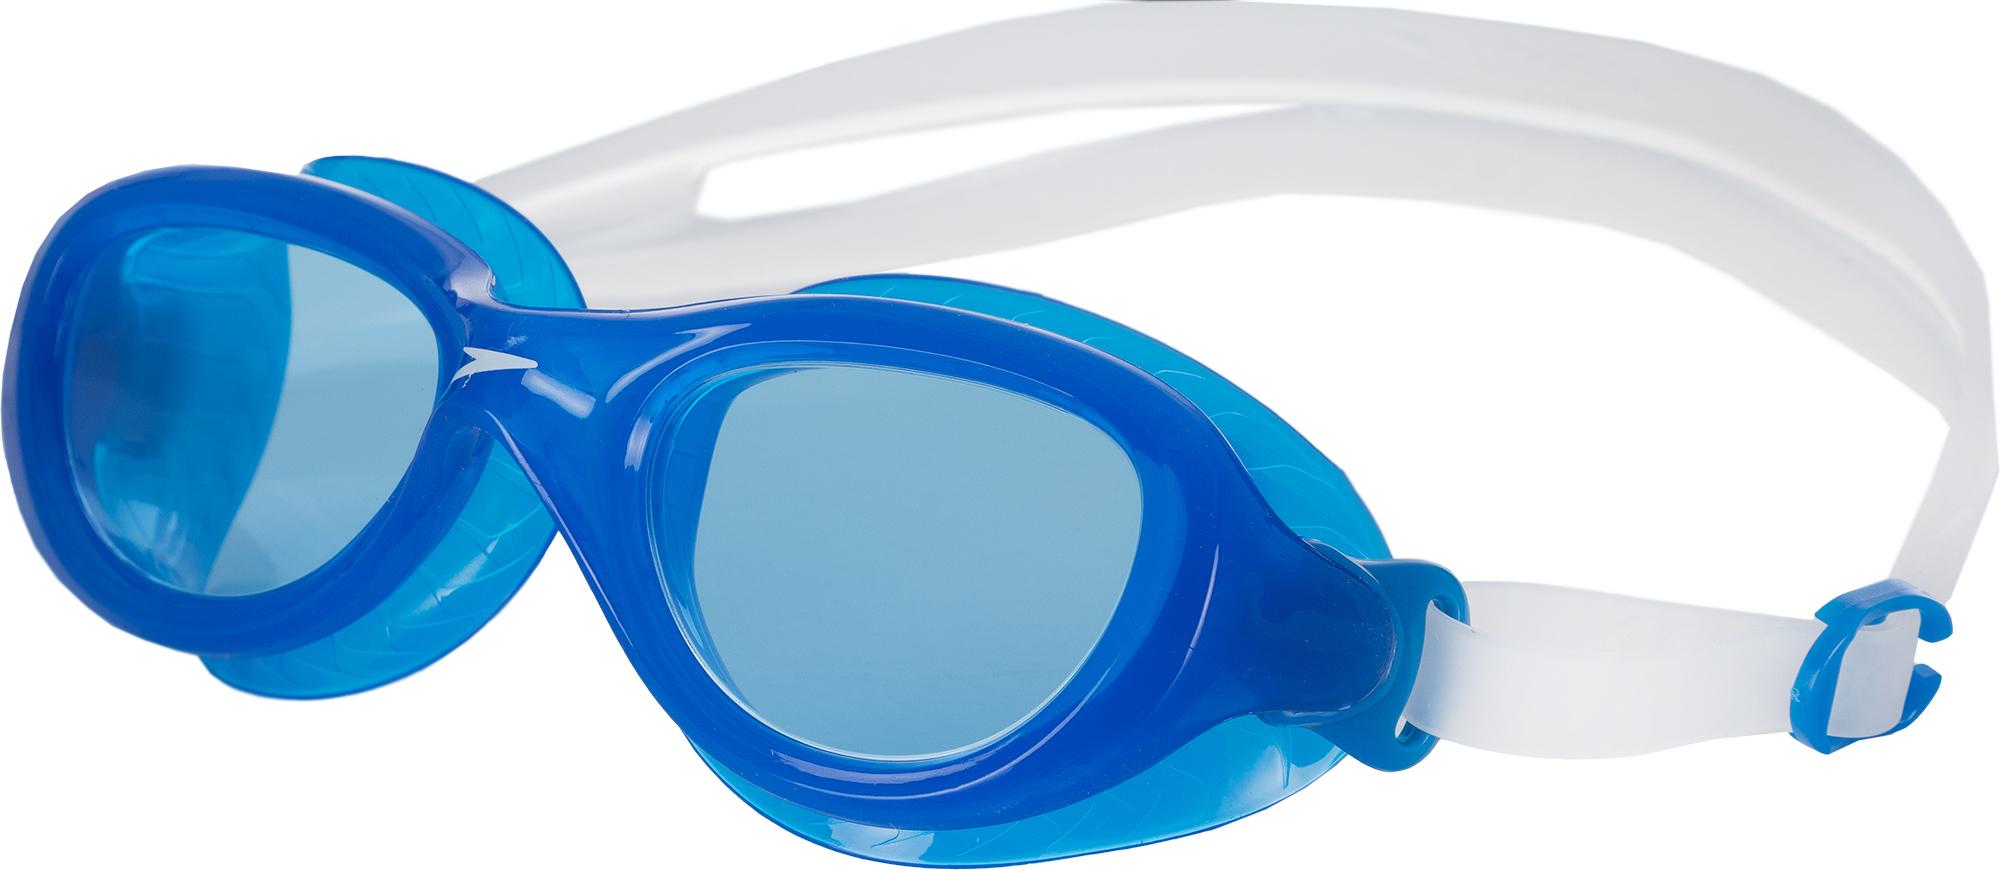 Speedo Очки для плавания детские Speedo Futura Classic цена и фото